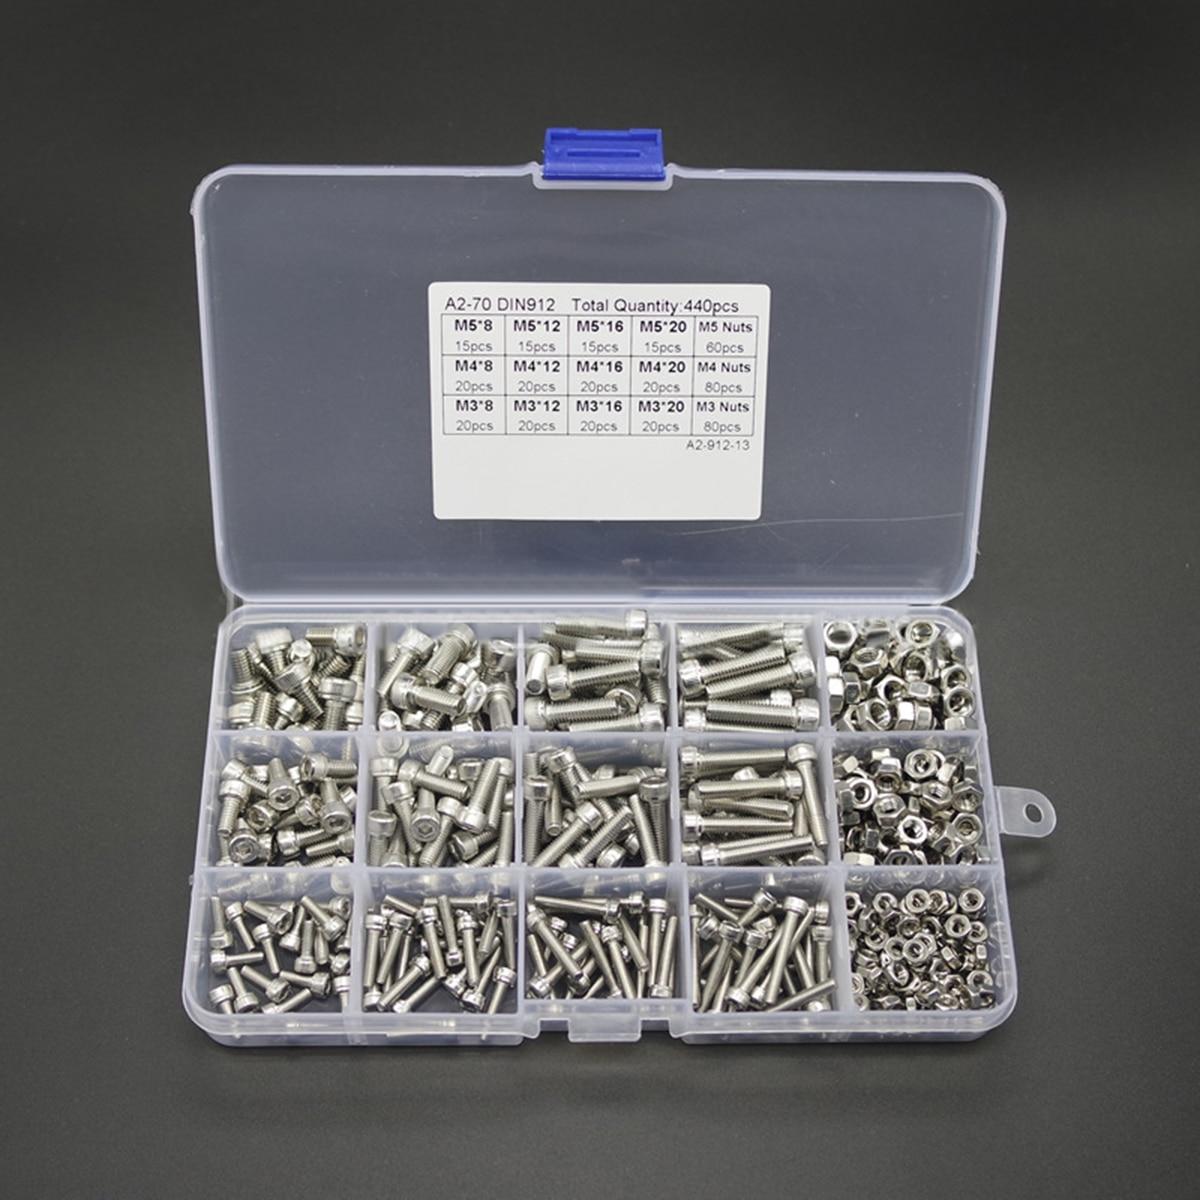 440pcs Stainless Steel Hex Socket Screws M3 M4 M5 Mayitr Button Head Bolts Nuts Kit with Plastic Box get ready for ielts workbook pre intermediate to intermediate ielts band 3 5 4 5